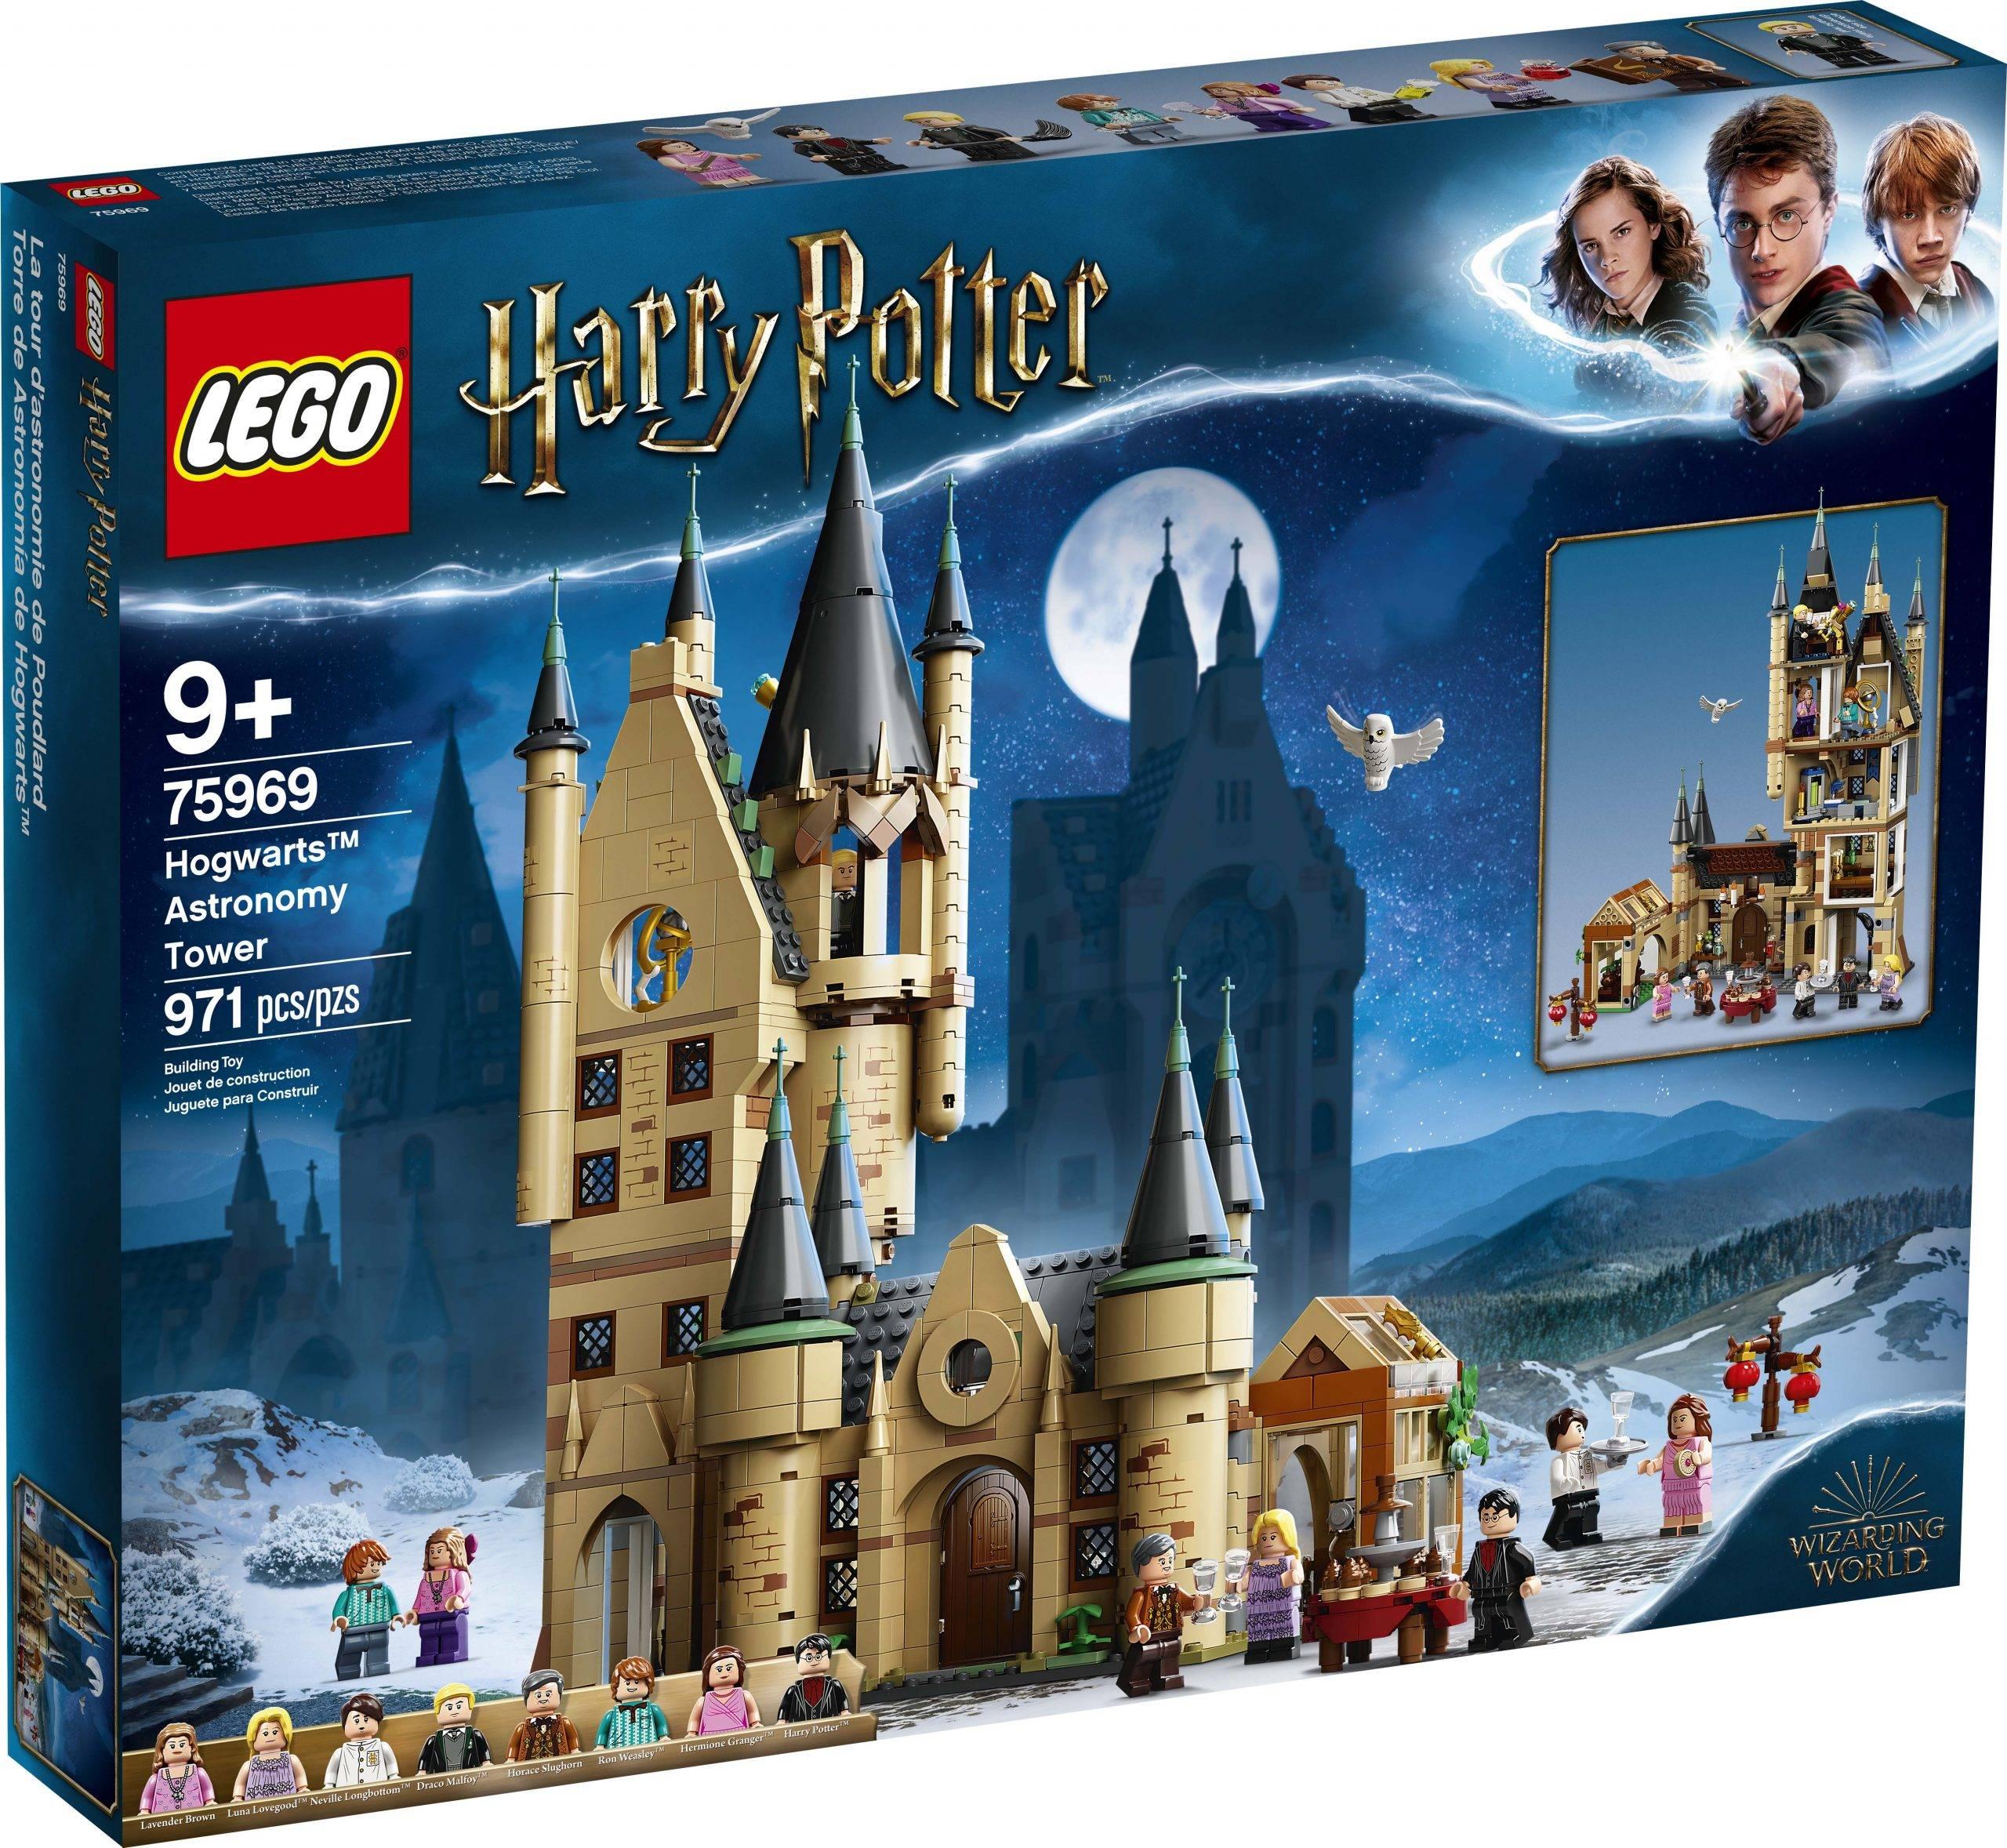 New Harry Potter Hogwarts Astronomy Set